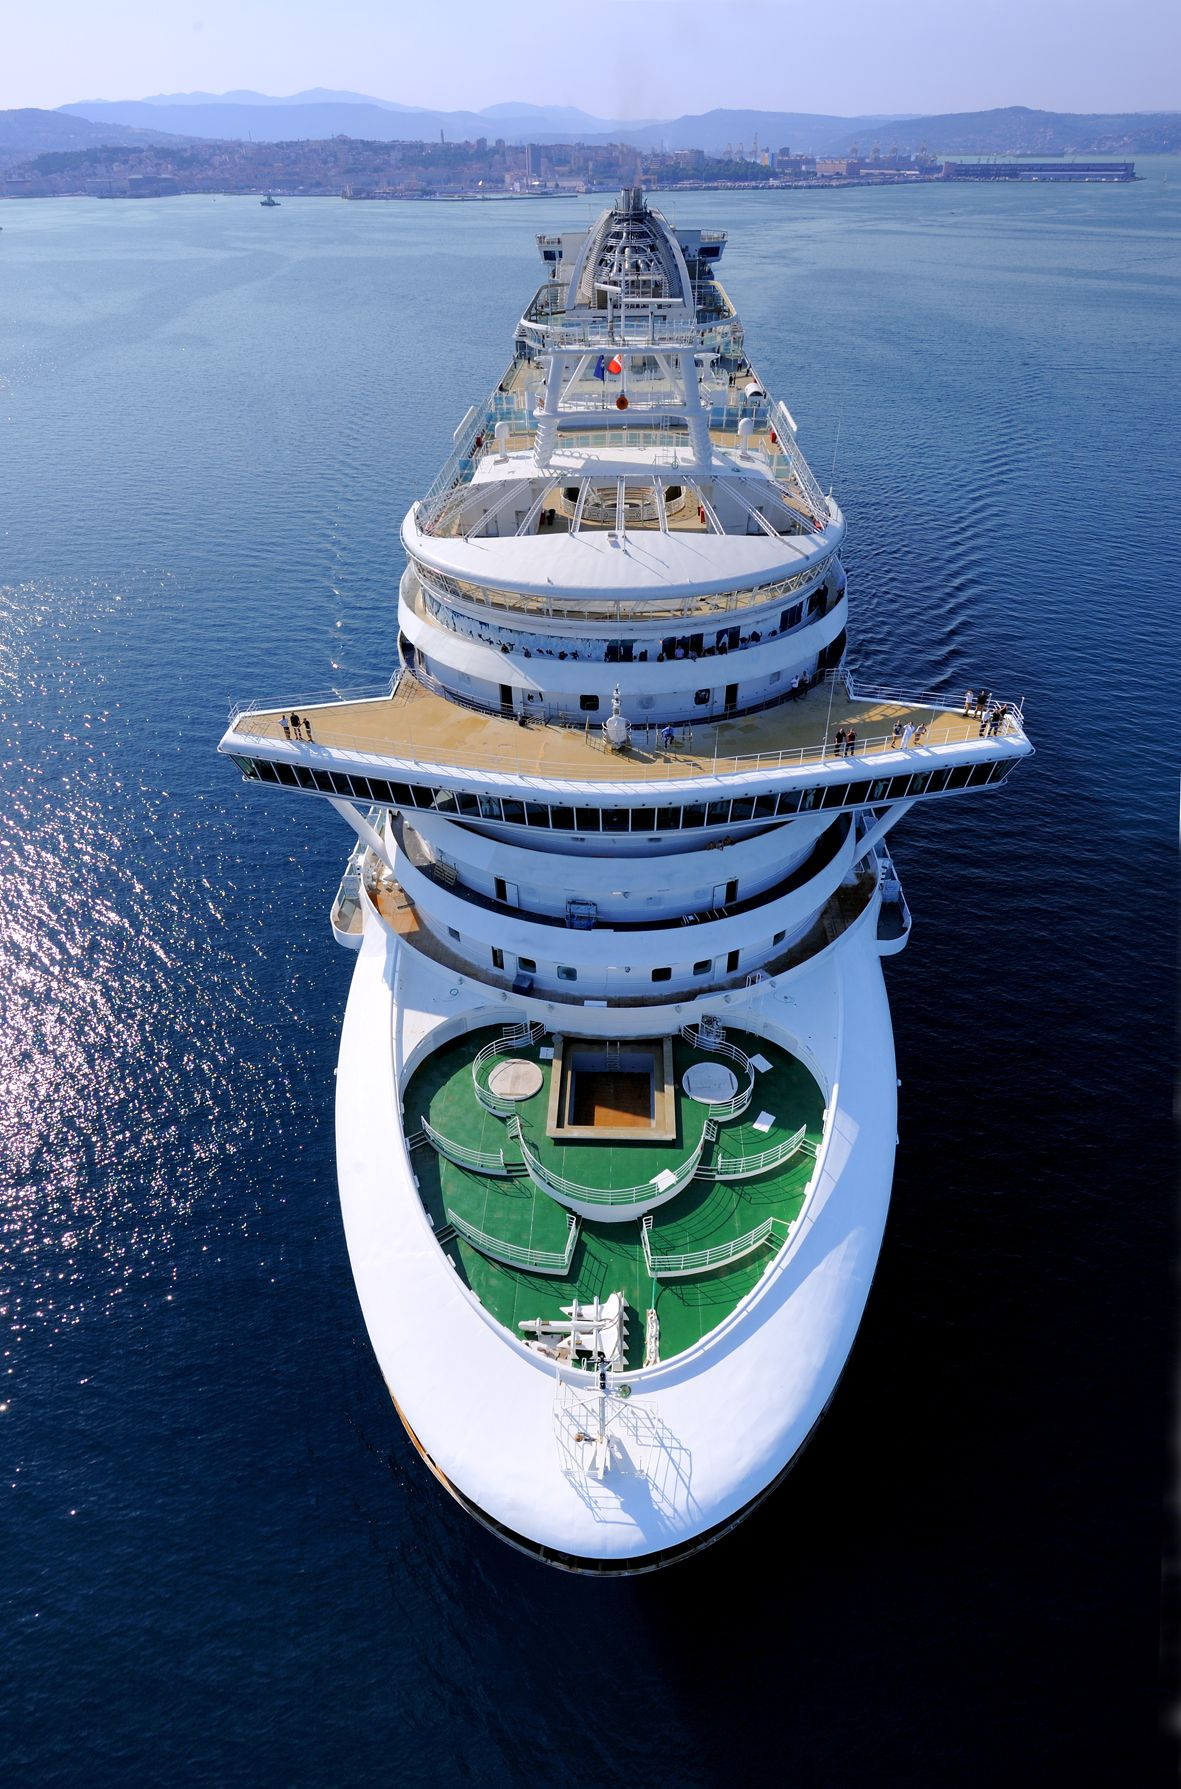 Ruby Princess Cruise Ship of Princess Cruises